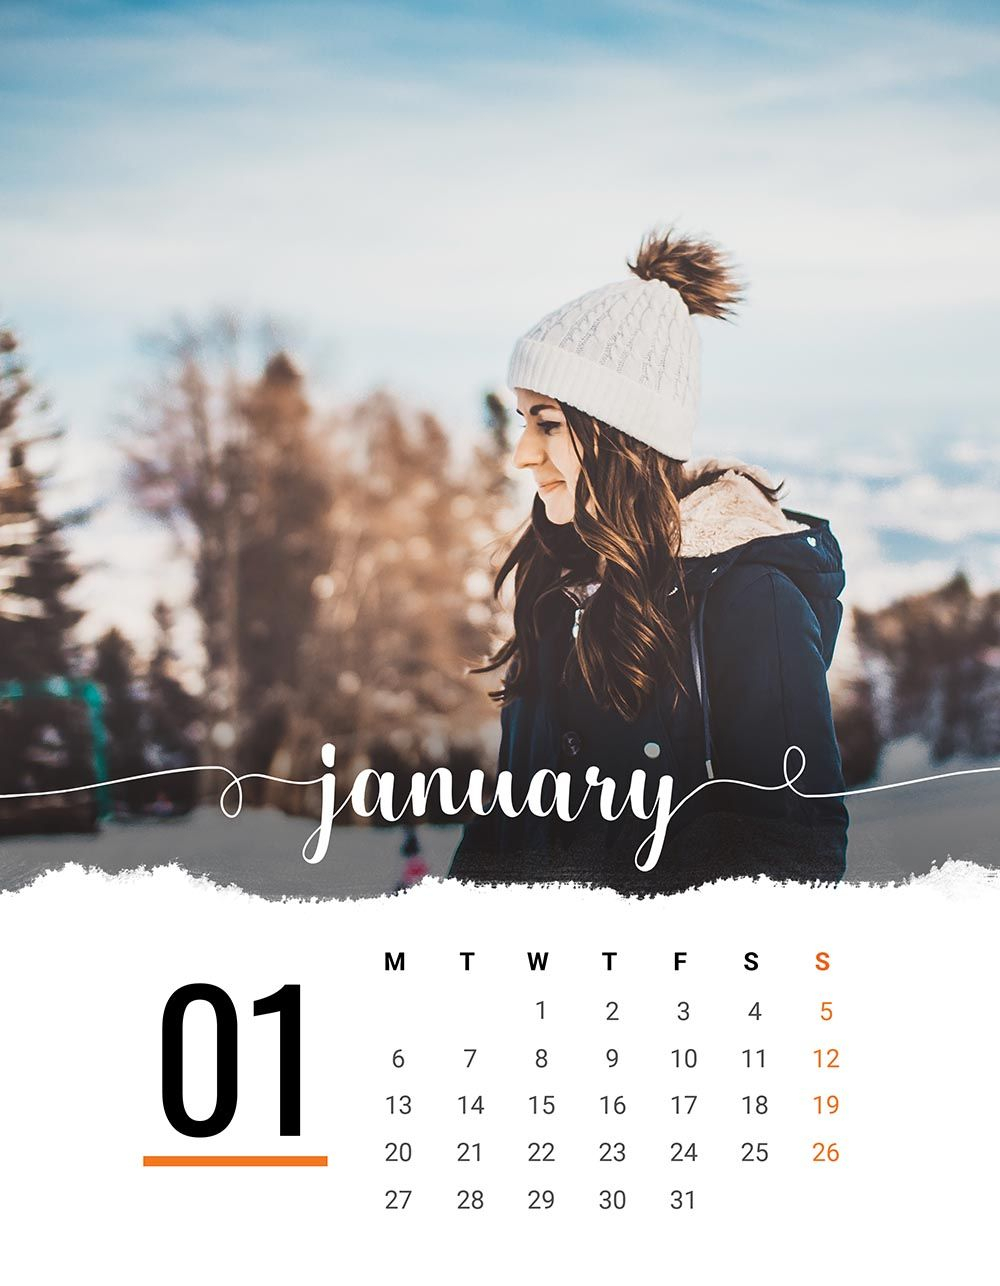 2020 Printable Calendar Template | Add Your Own Photos